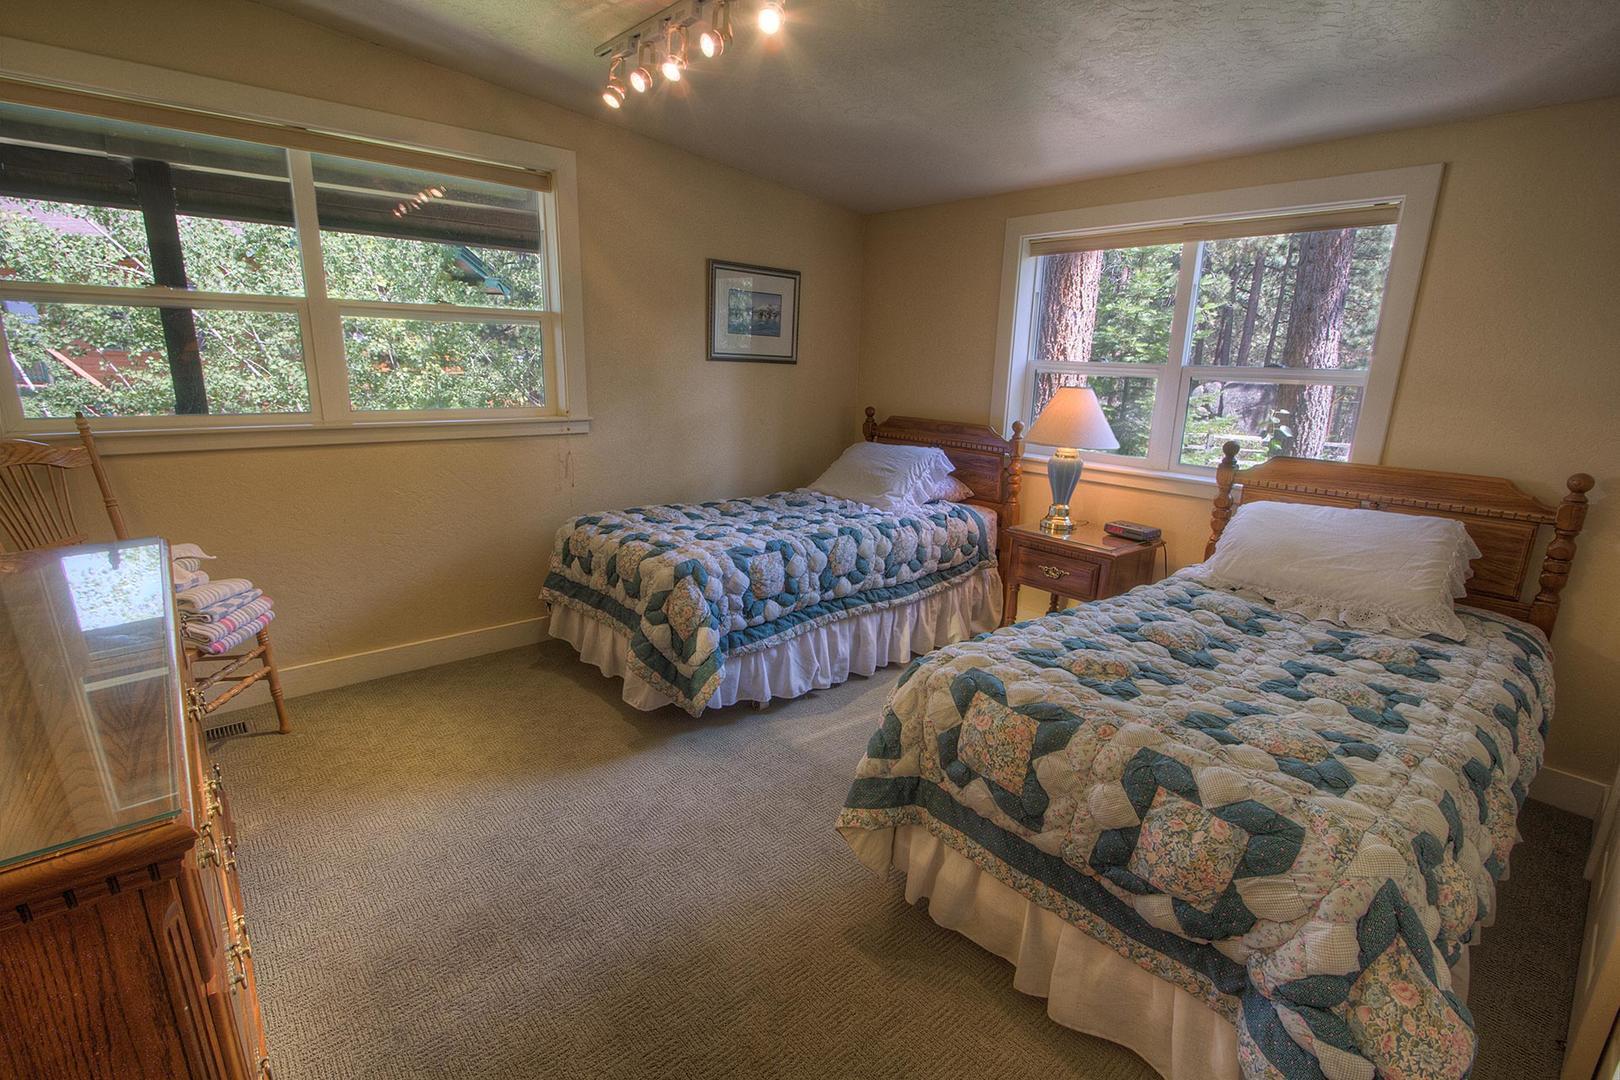 hch1202 bedroom